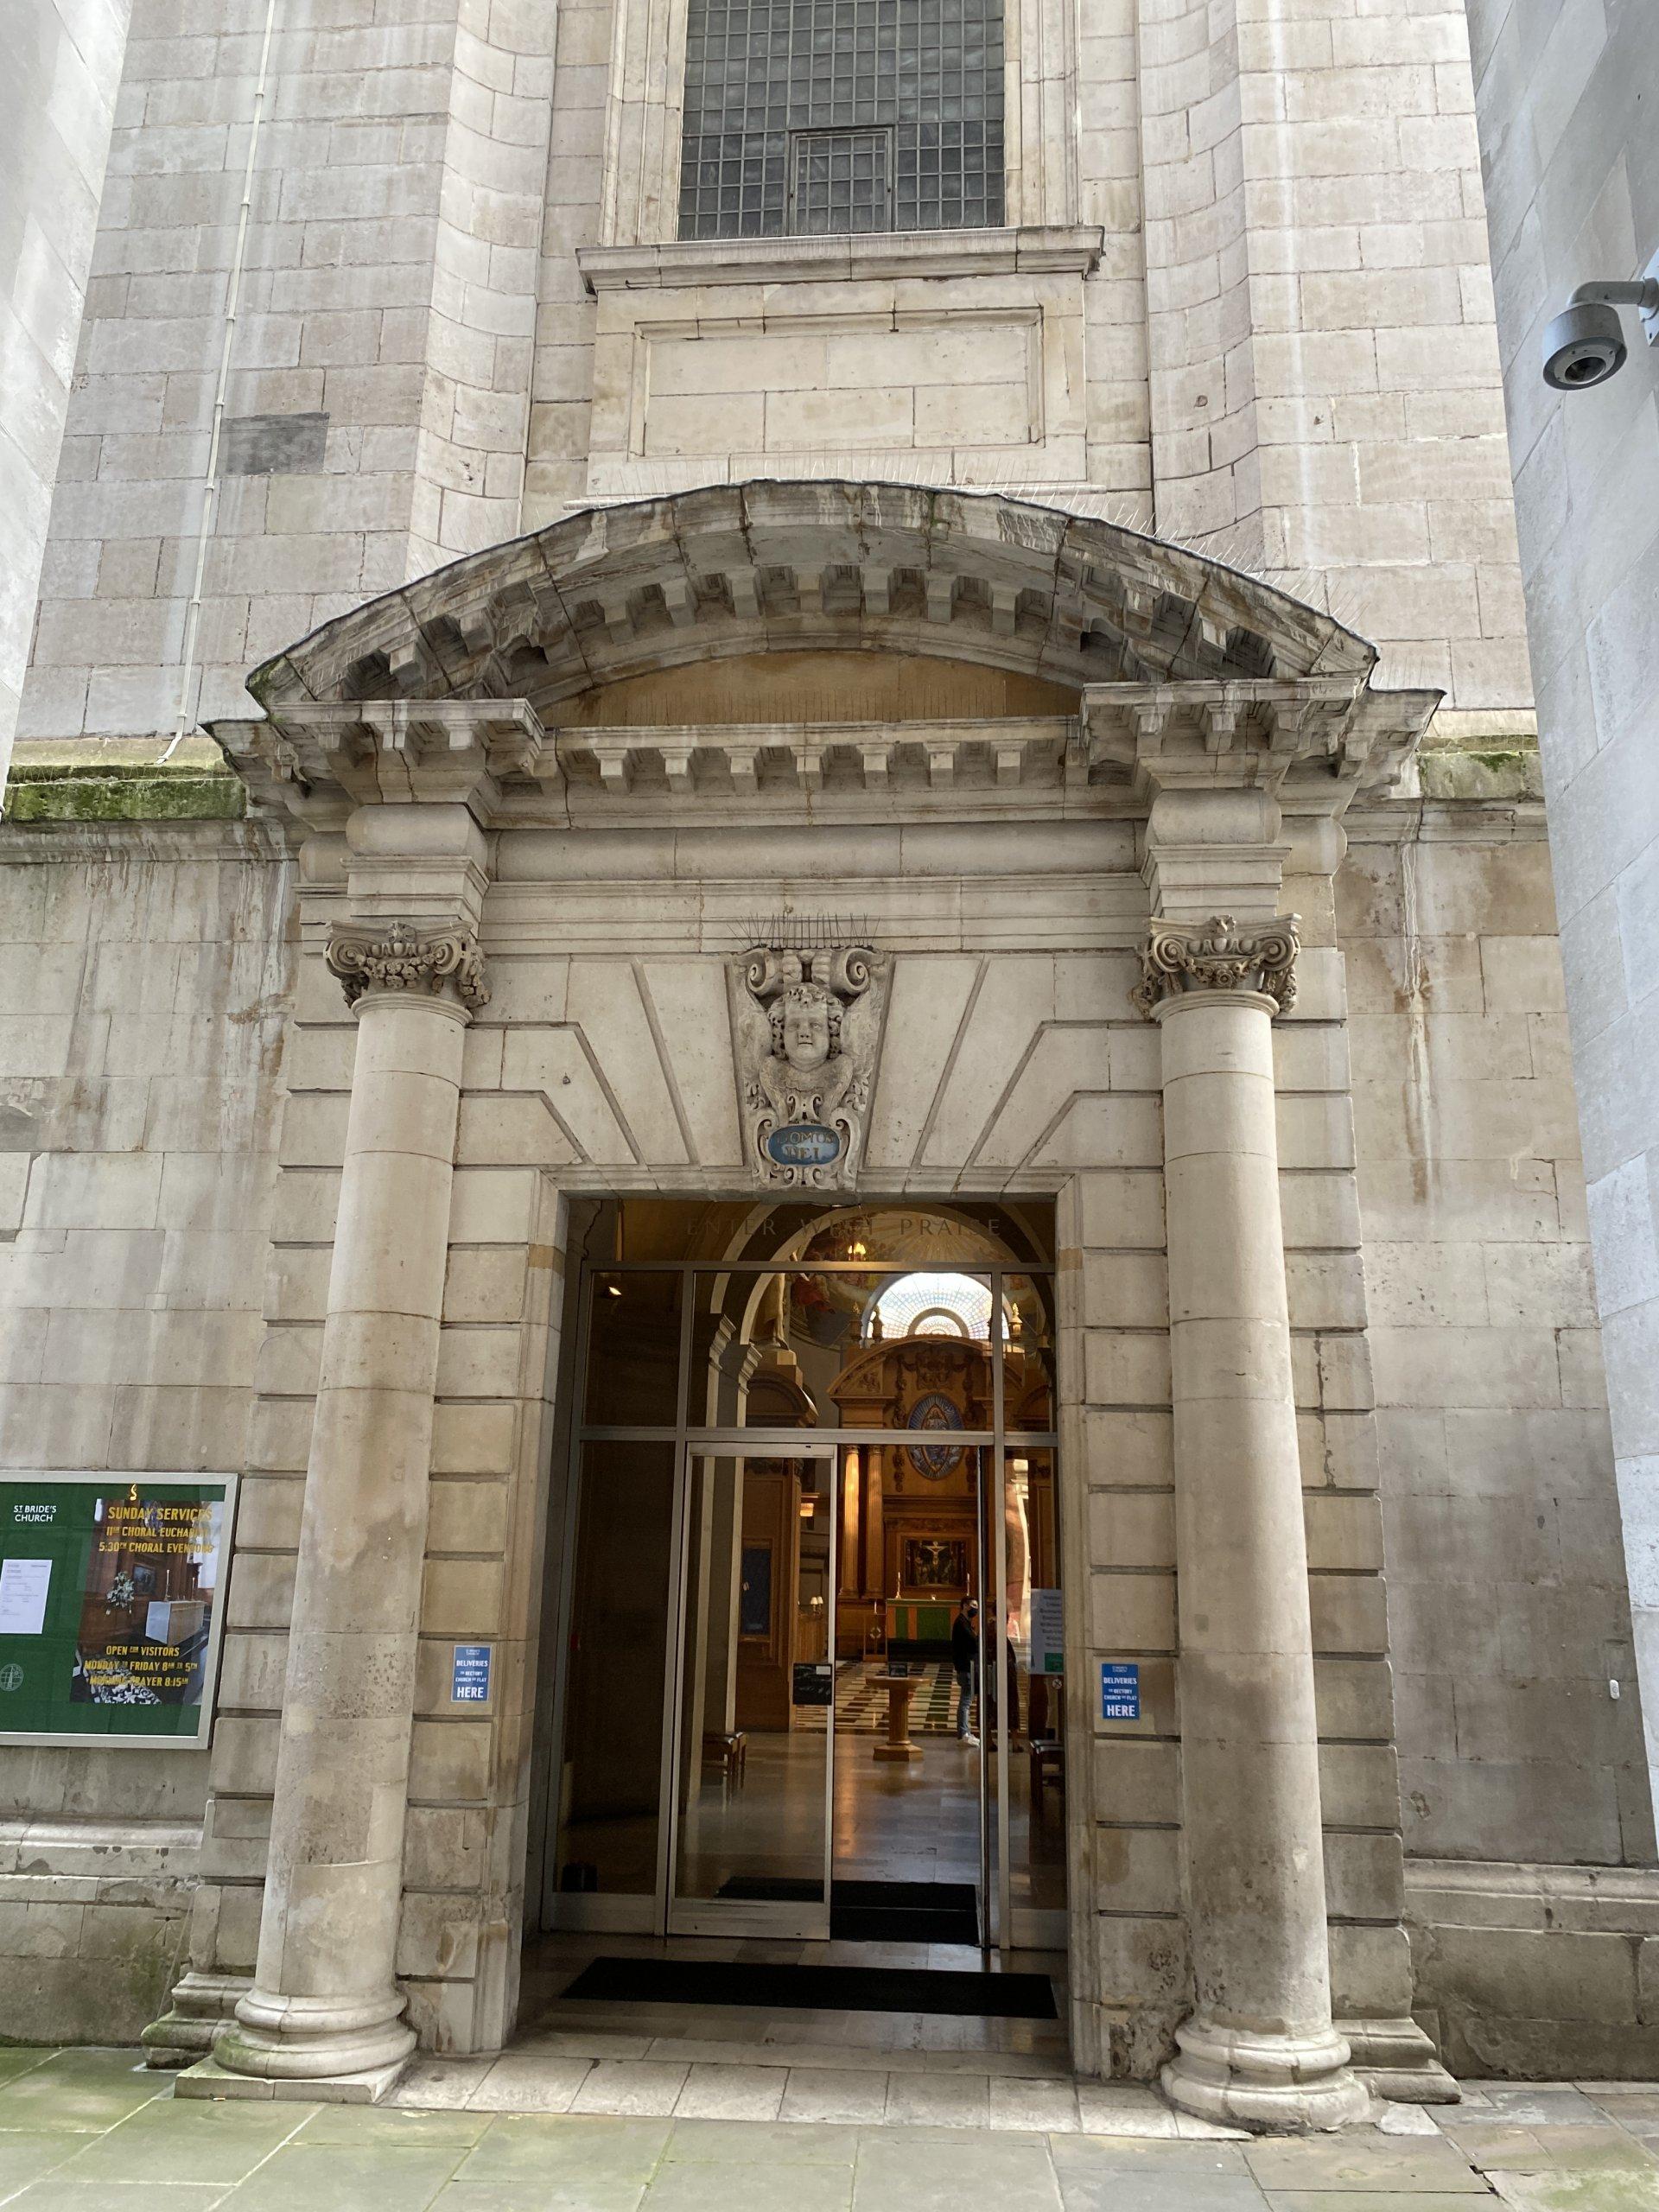 Great West Doors, St Bride's Church, London